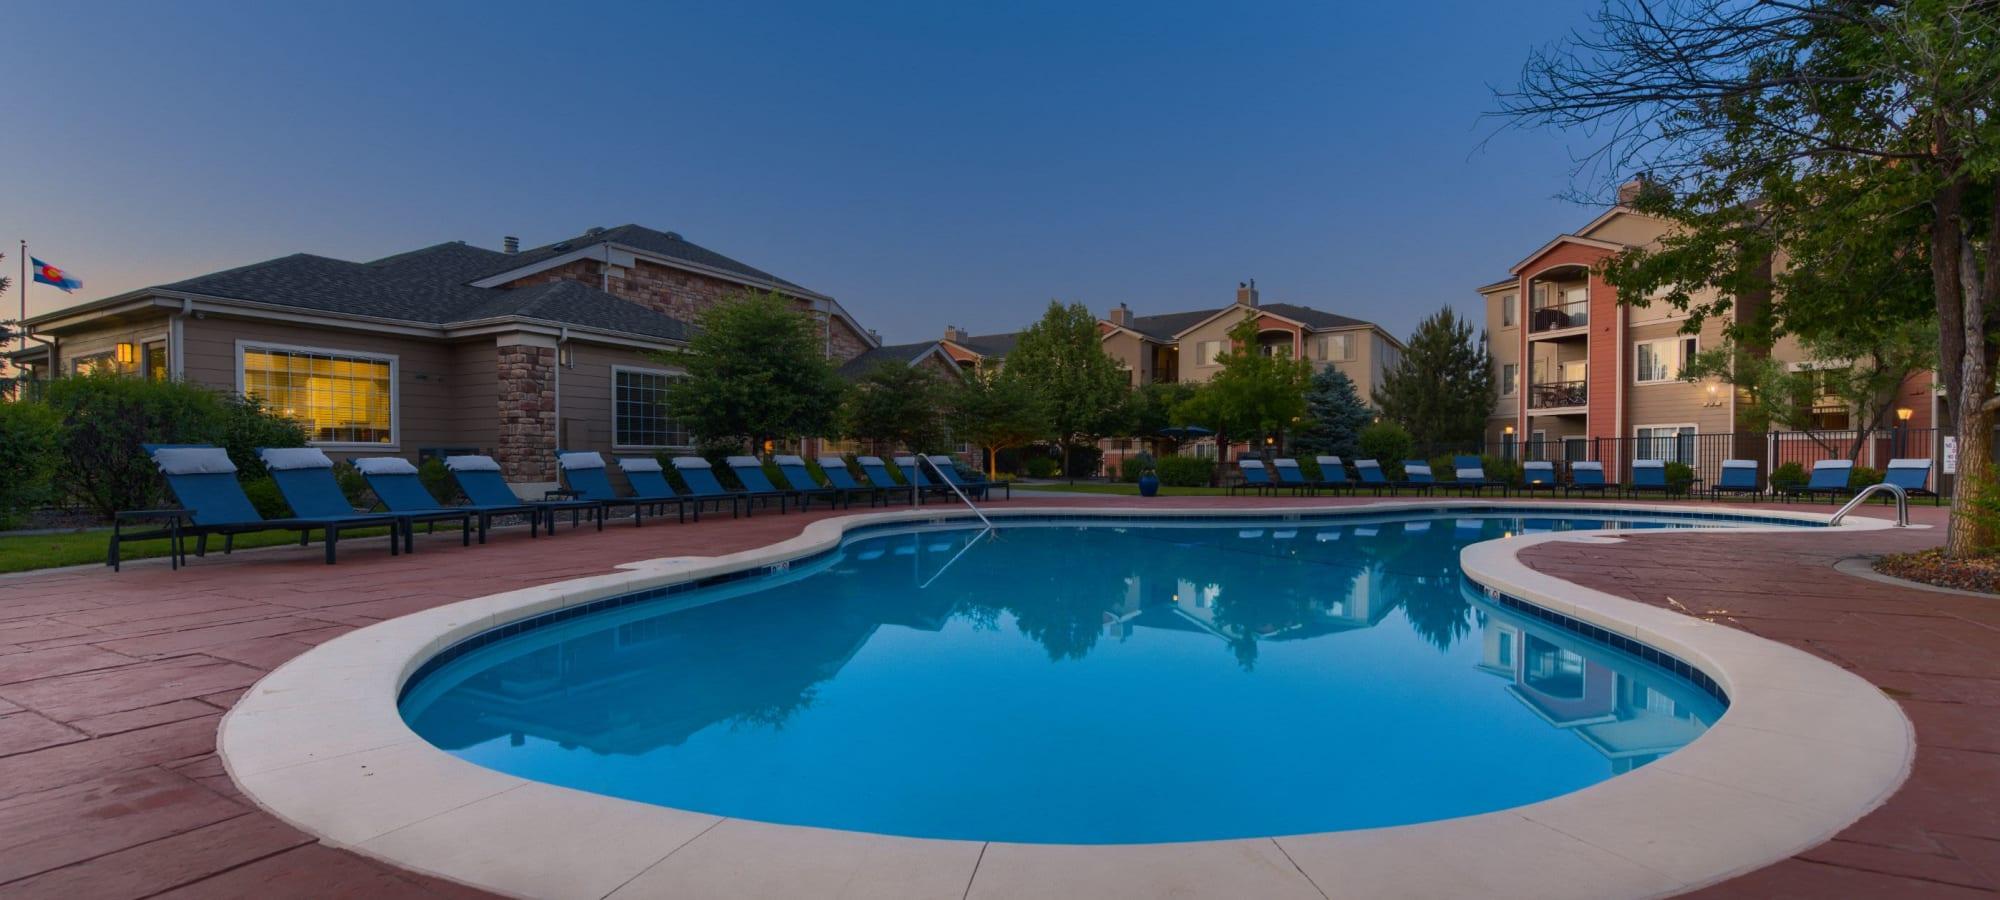 Apartments at Whisper Creek Apartment Homes in Lakewood, Colorado